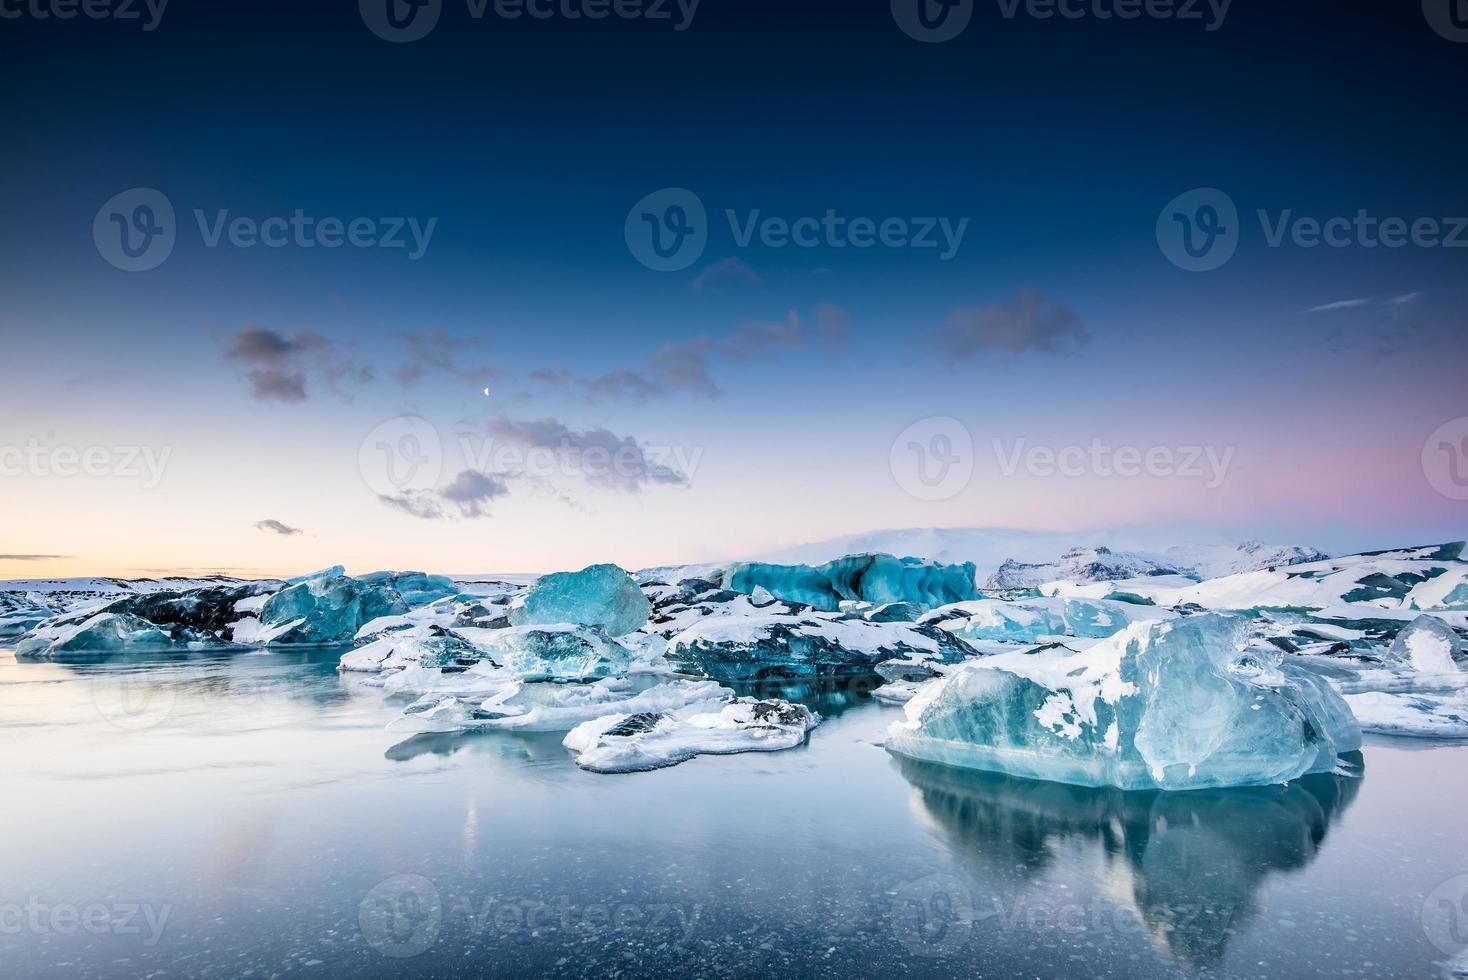 icebergs flotando en el lago glaciar jokulsarlon al atardecer. sur de islandia. foto